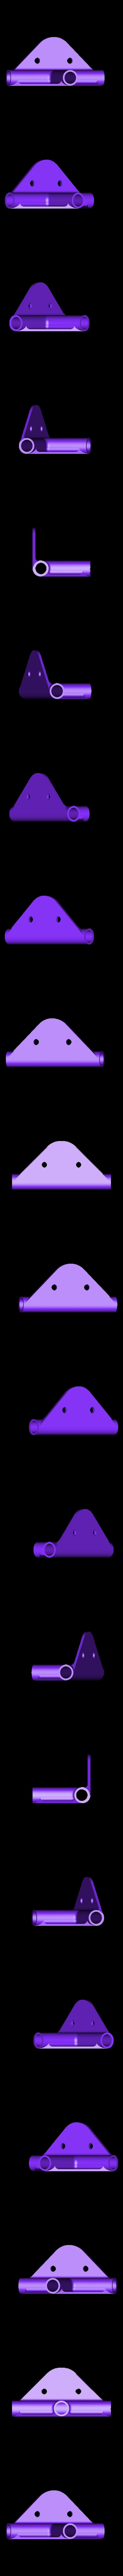 raccord droit  3tubes patte 90.stl Download free STL file Pipe brackets dia 12 • 3D printing model, mk25